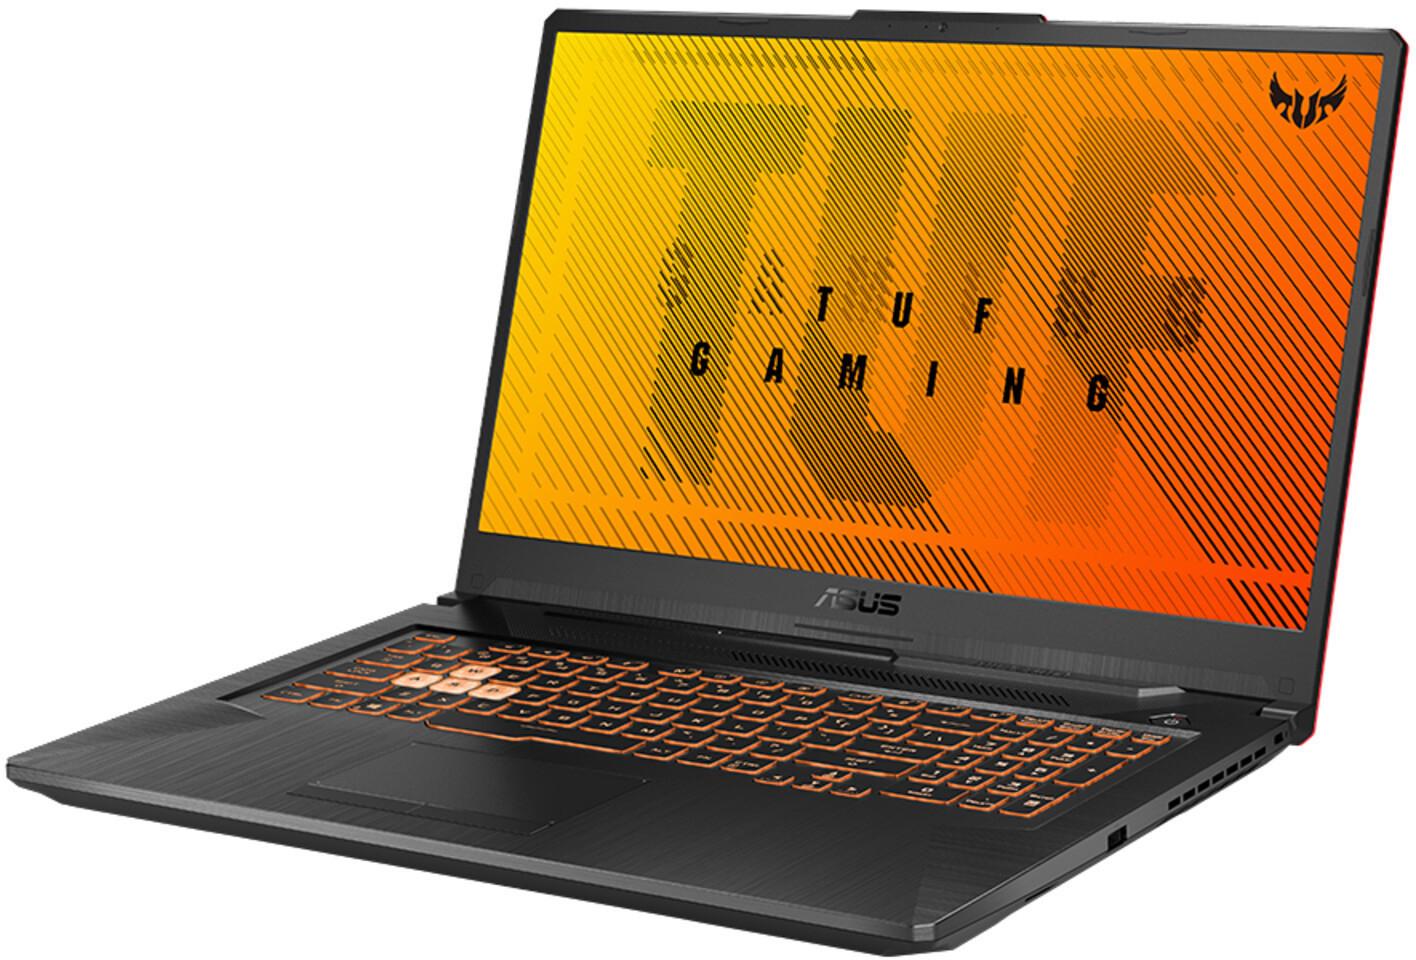 "ASUS TUF Gaming A17 - 17.3"" FHD IPS, Ryzen 5 4600H, 8GB RAM, 512GB SSD, GTX 1660 Ti 6GB, USB-C 3/ DP, Wlan ac, Win10 für 830.34€"